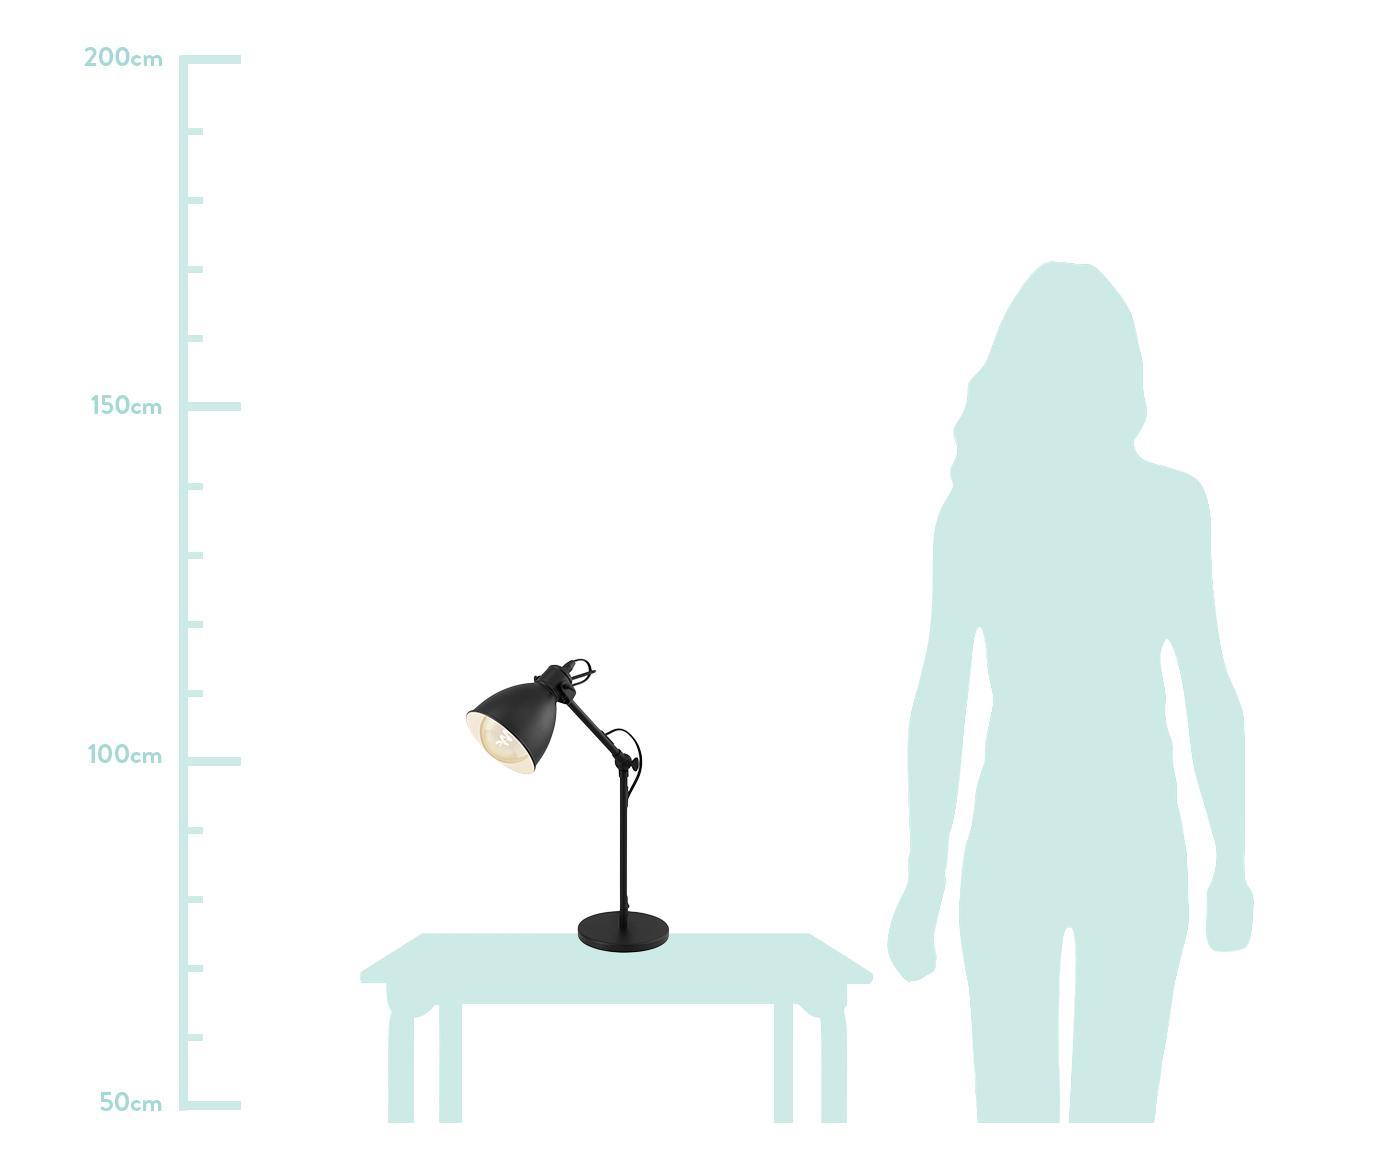 Tafellamp Ethan, Lampenkap: gepoedercoat metaal, Lampvoet: gepoedercoat metaal, Zwart, Ø 15 x H 43 cm